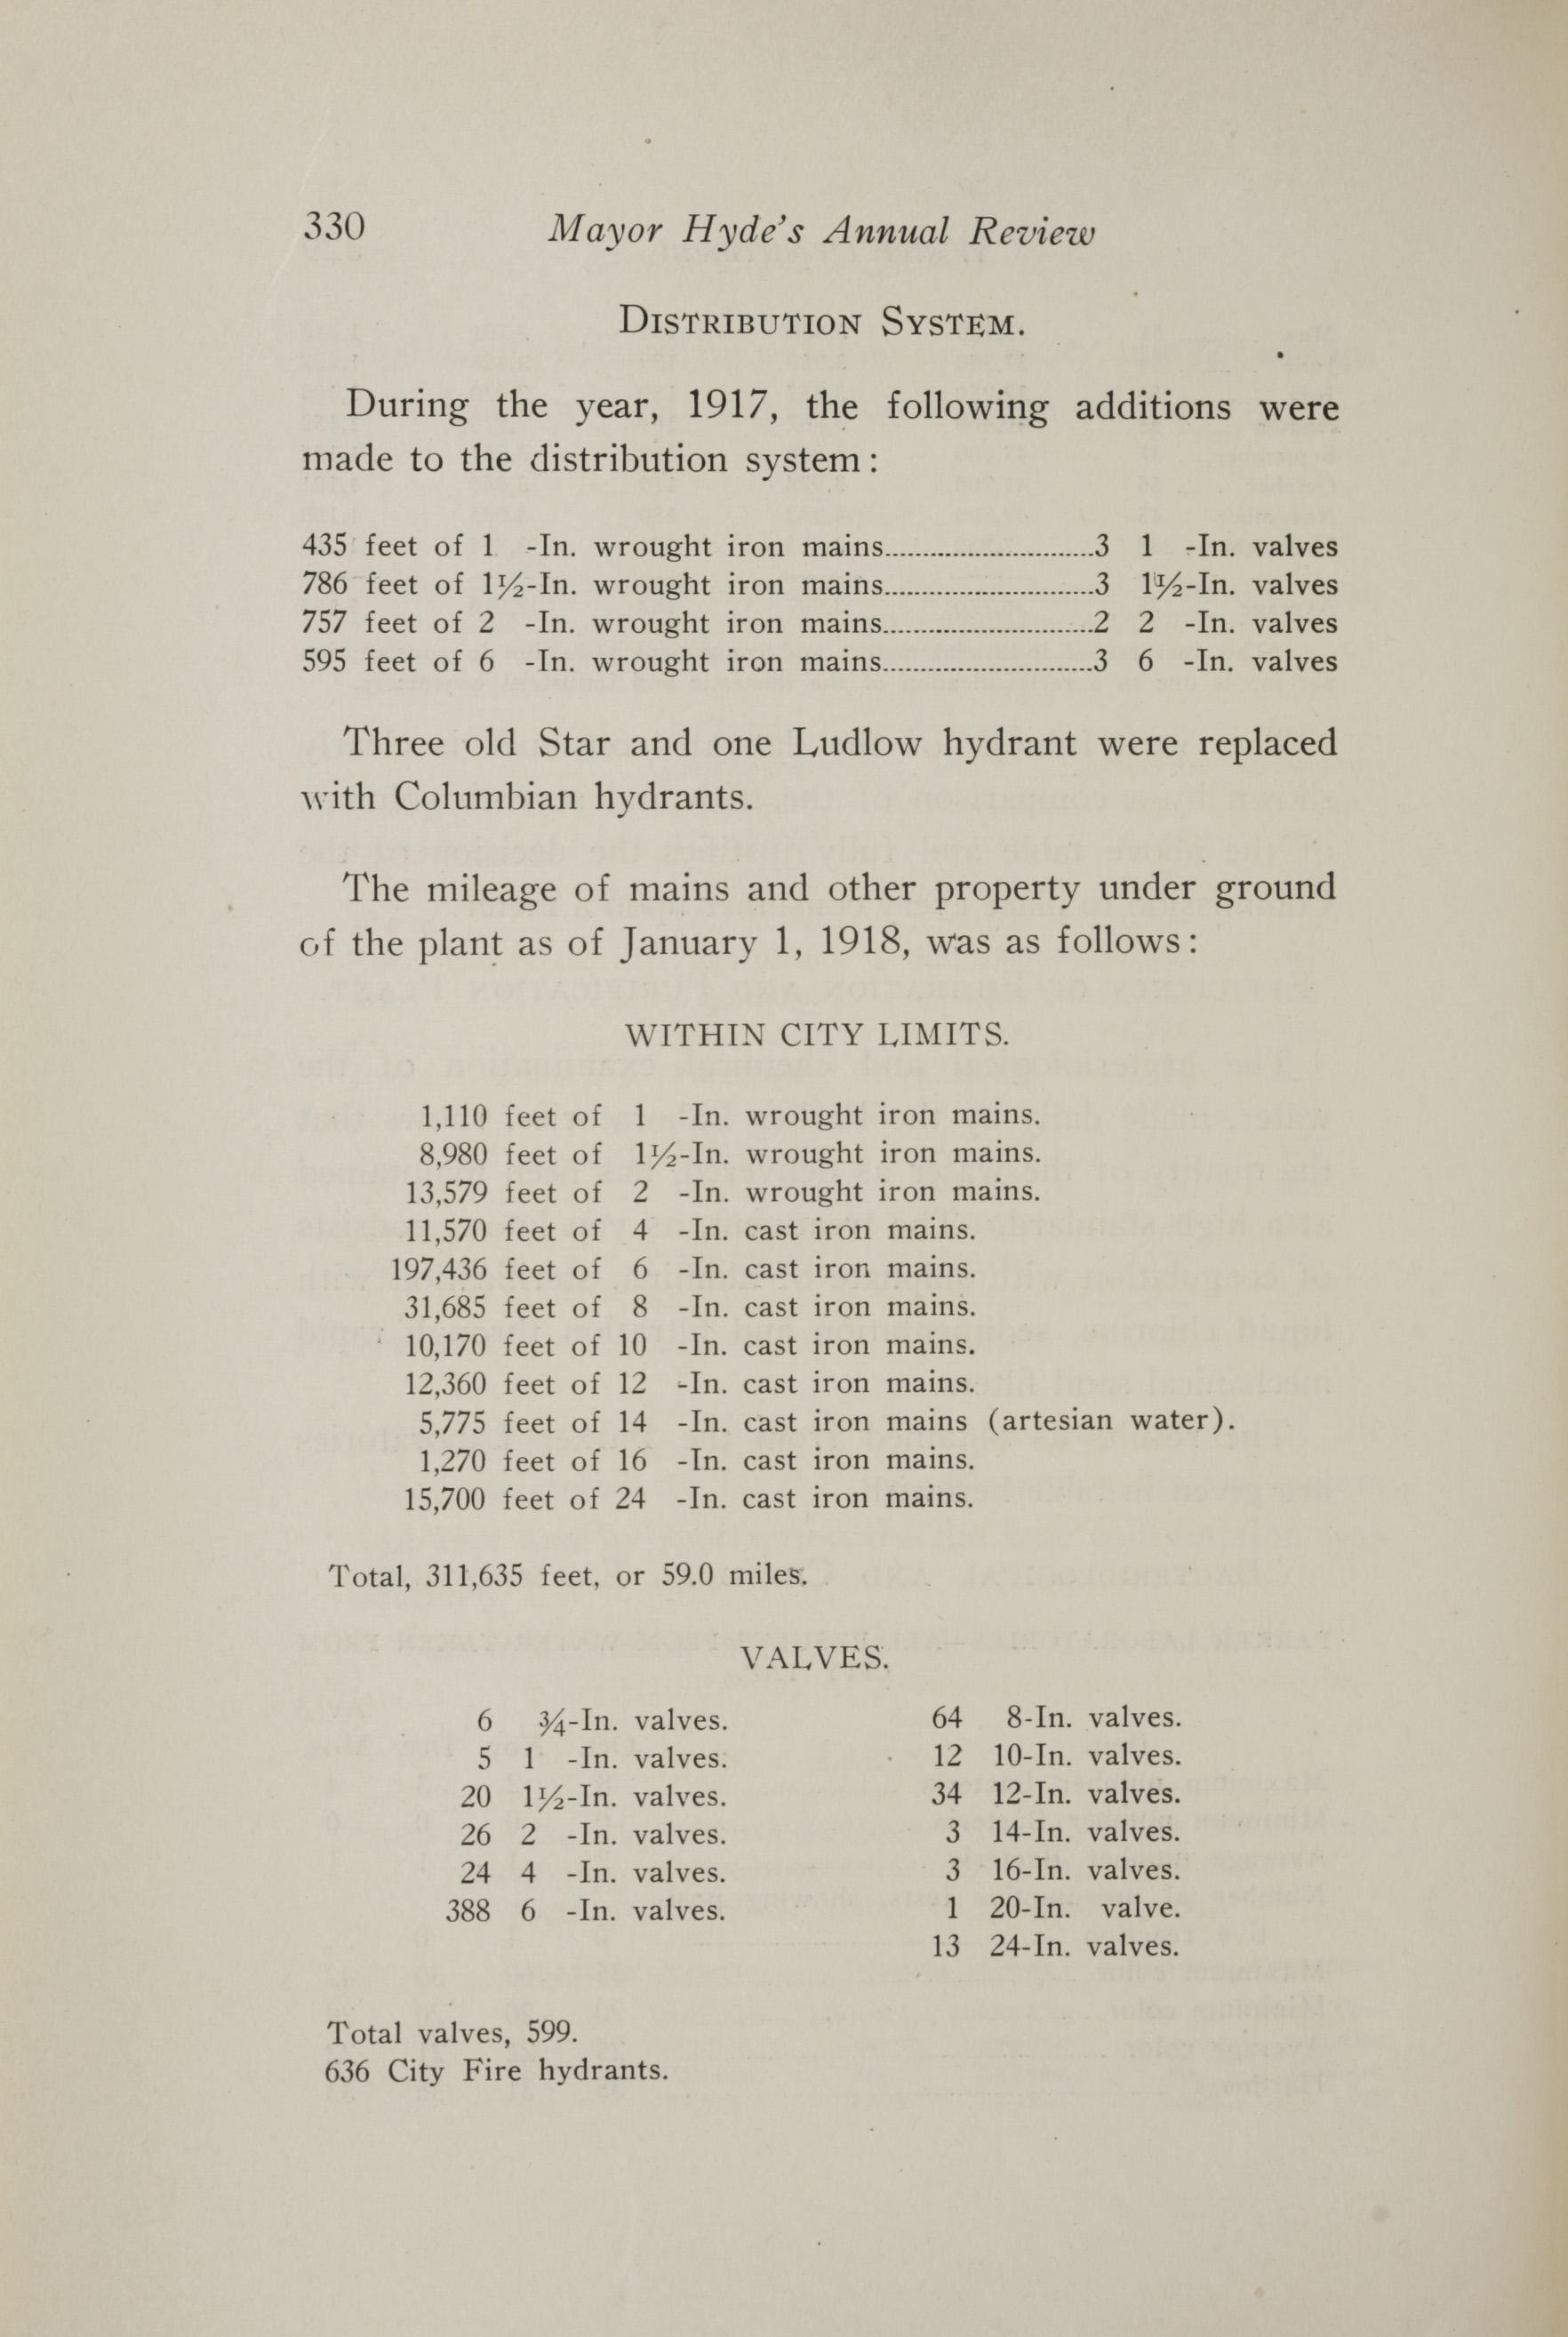 Charleston Yearbook, 1917, page 330